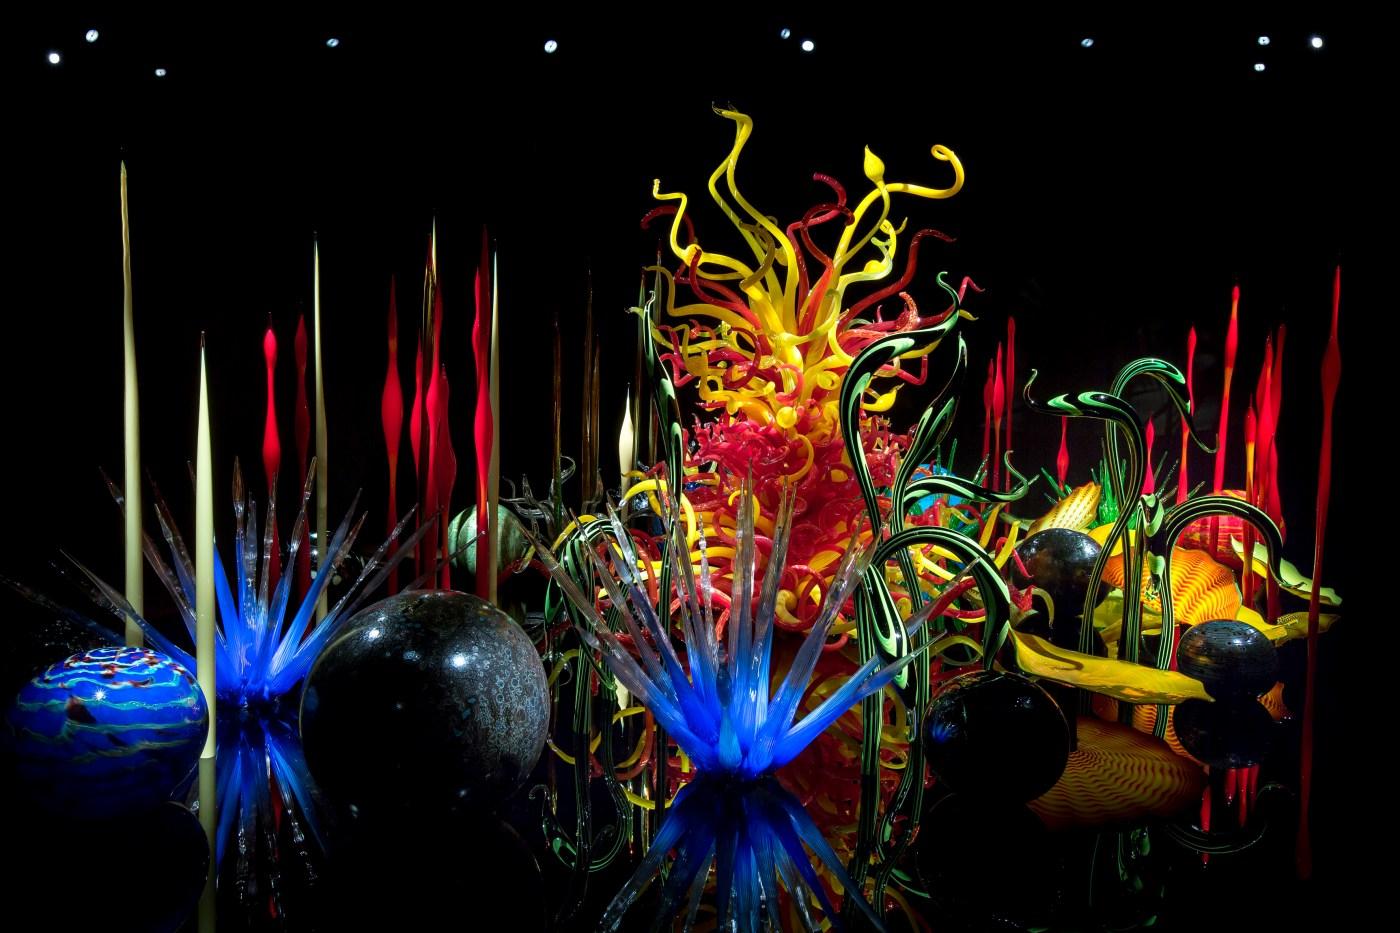 Dale Chihuly, Toyama Mille Fiori, Toyama Glass Art Museum, Toyama, Japan 《千朵花》富山市玻璃美術館,2015 © Chihuly Studio